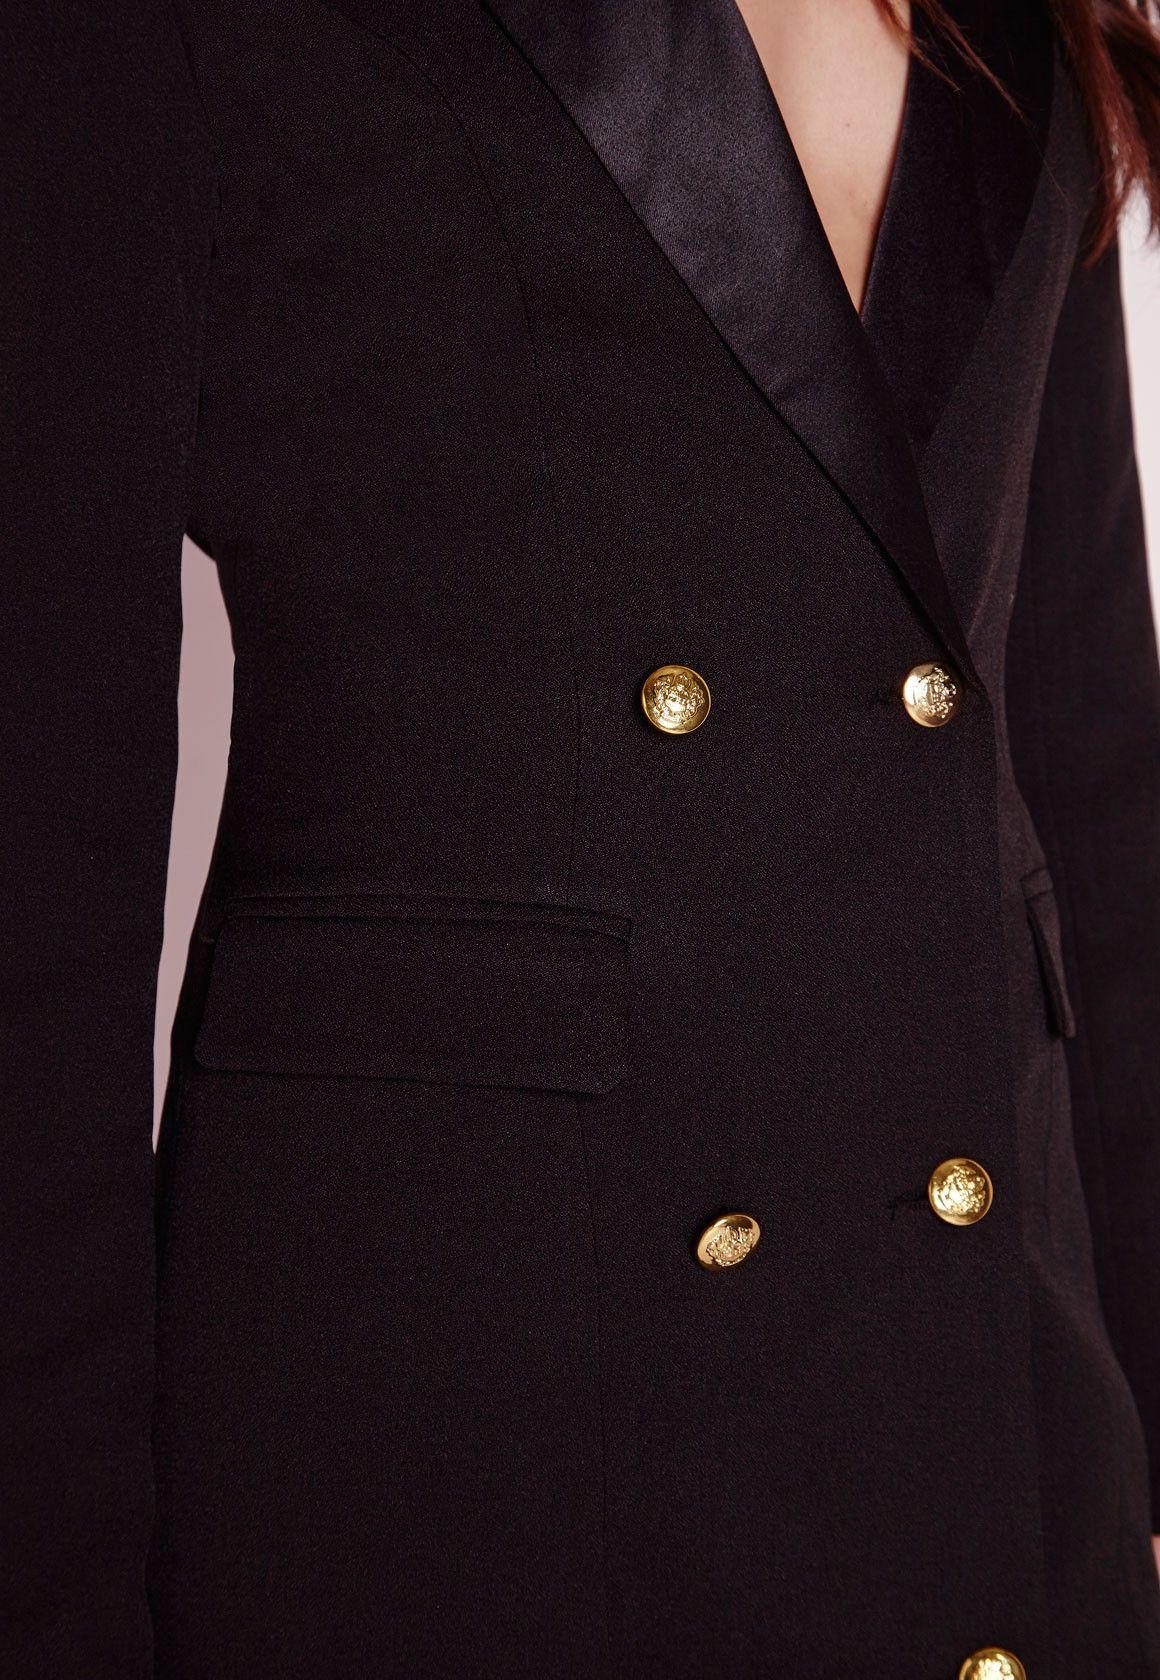 Missguided - Long Sleeve Tux Dress Black